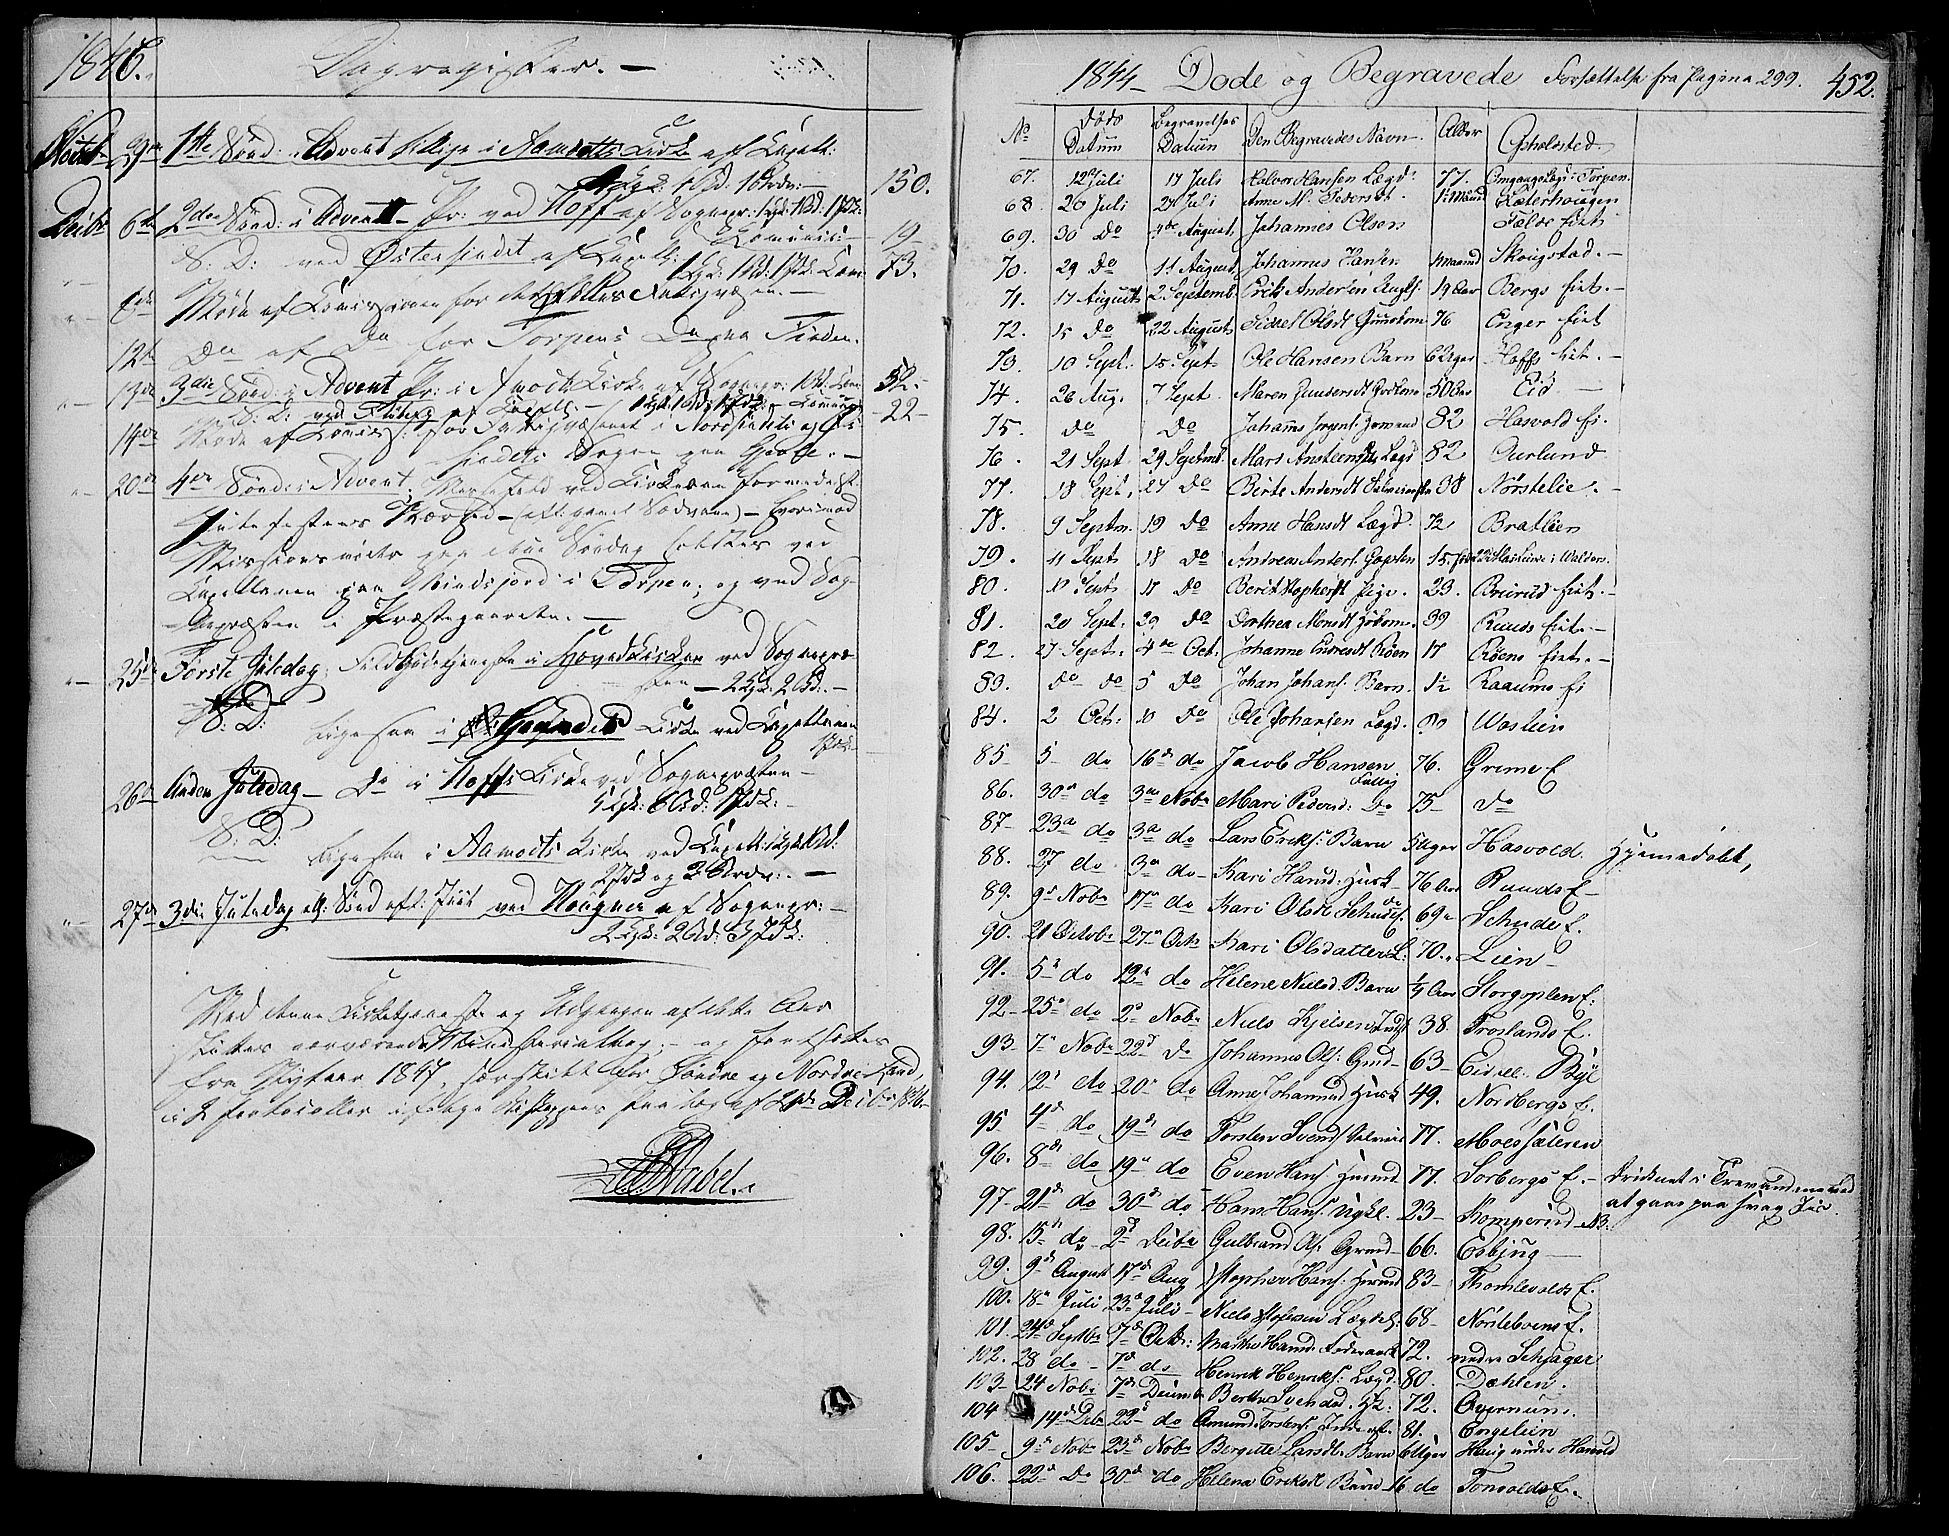 SAH, Land prestekontor, Ministerialbok nr. 8, 1830-1846, s. 452